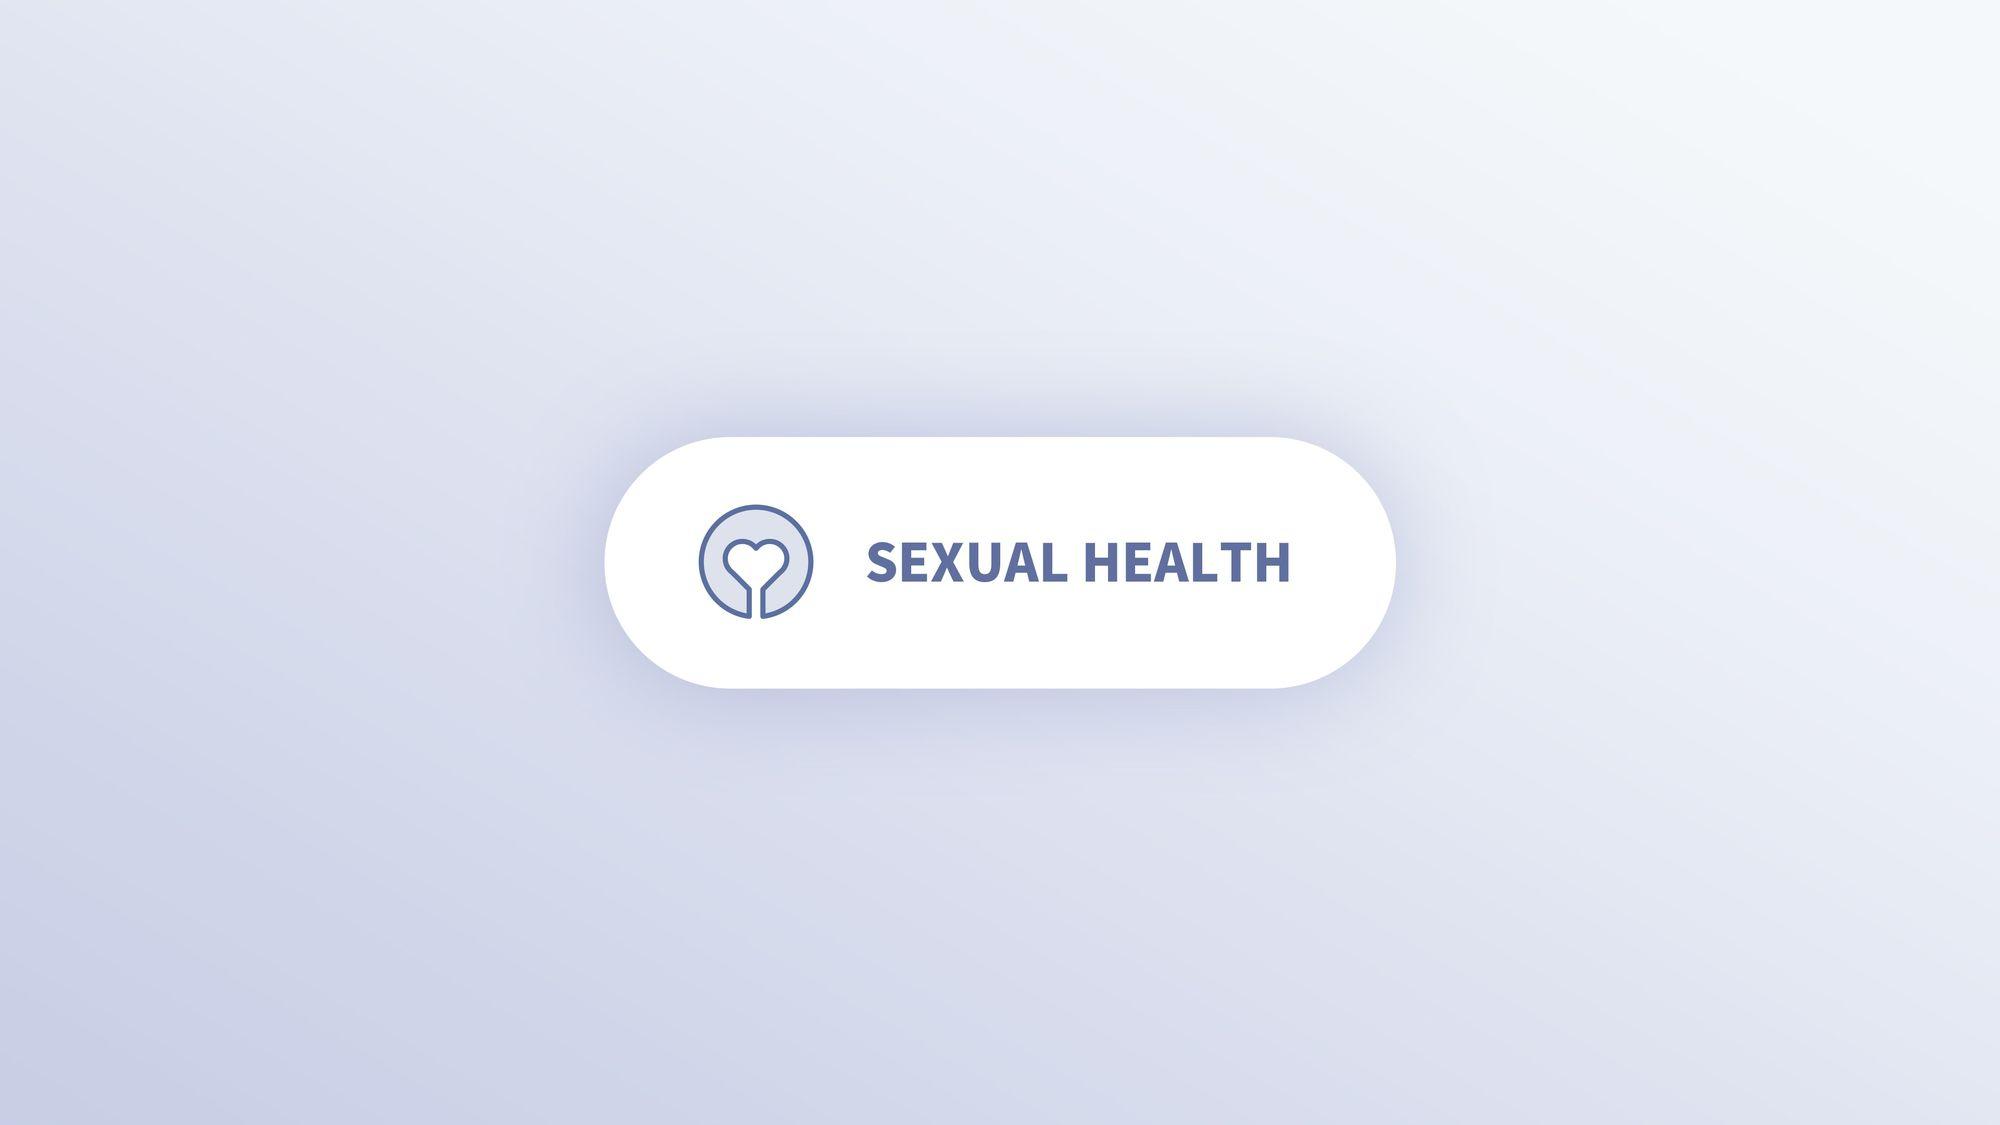 Sexual_Health_Icon  5  5